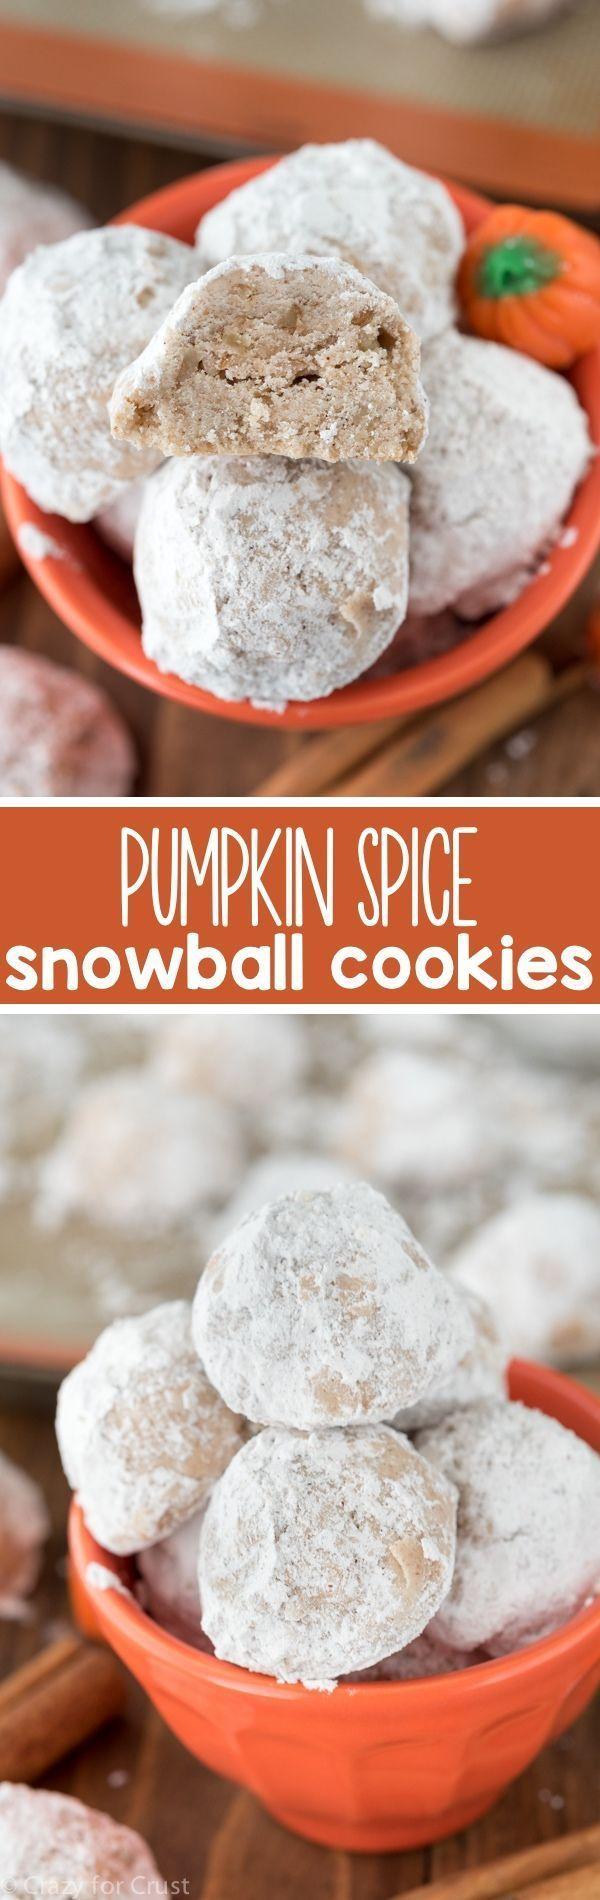 Pumpkin Spice Snowballs recipe